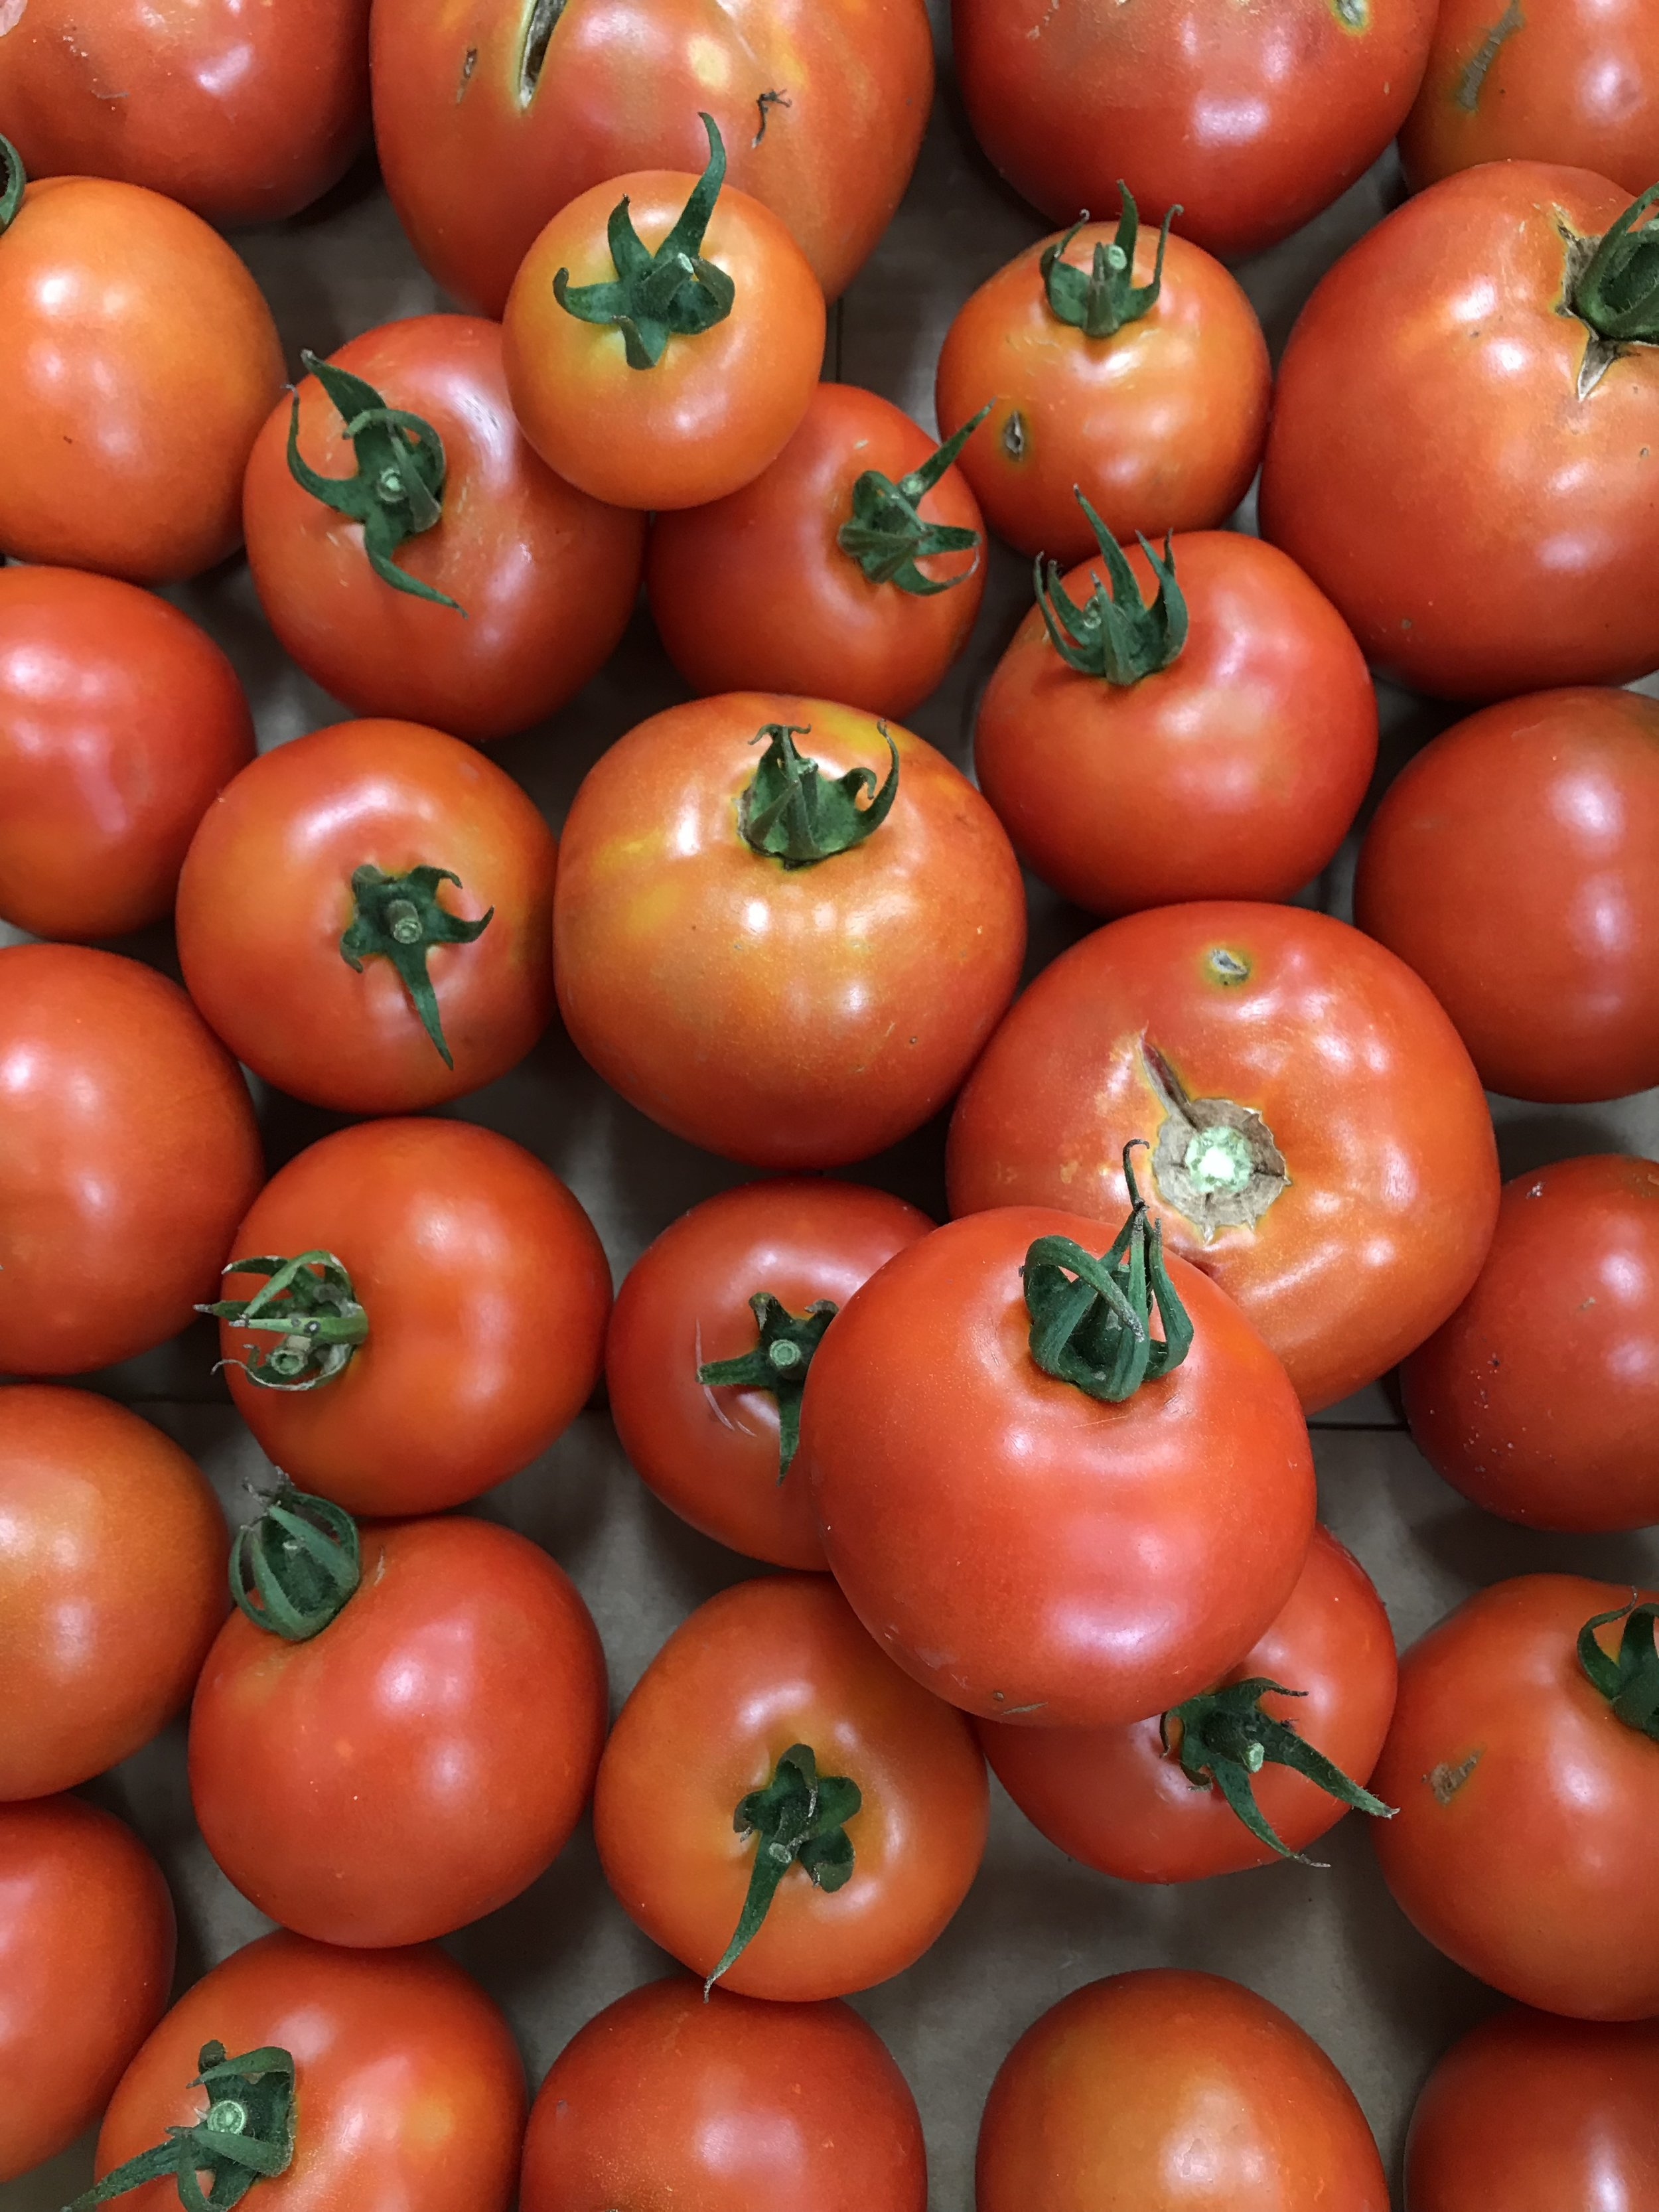 Tomato donation